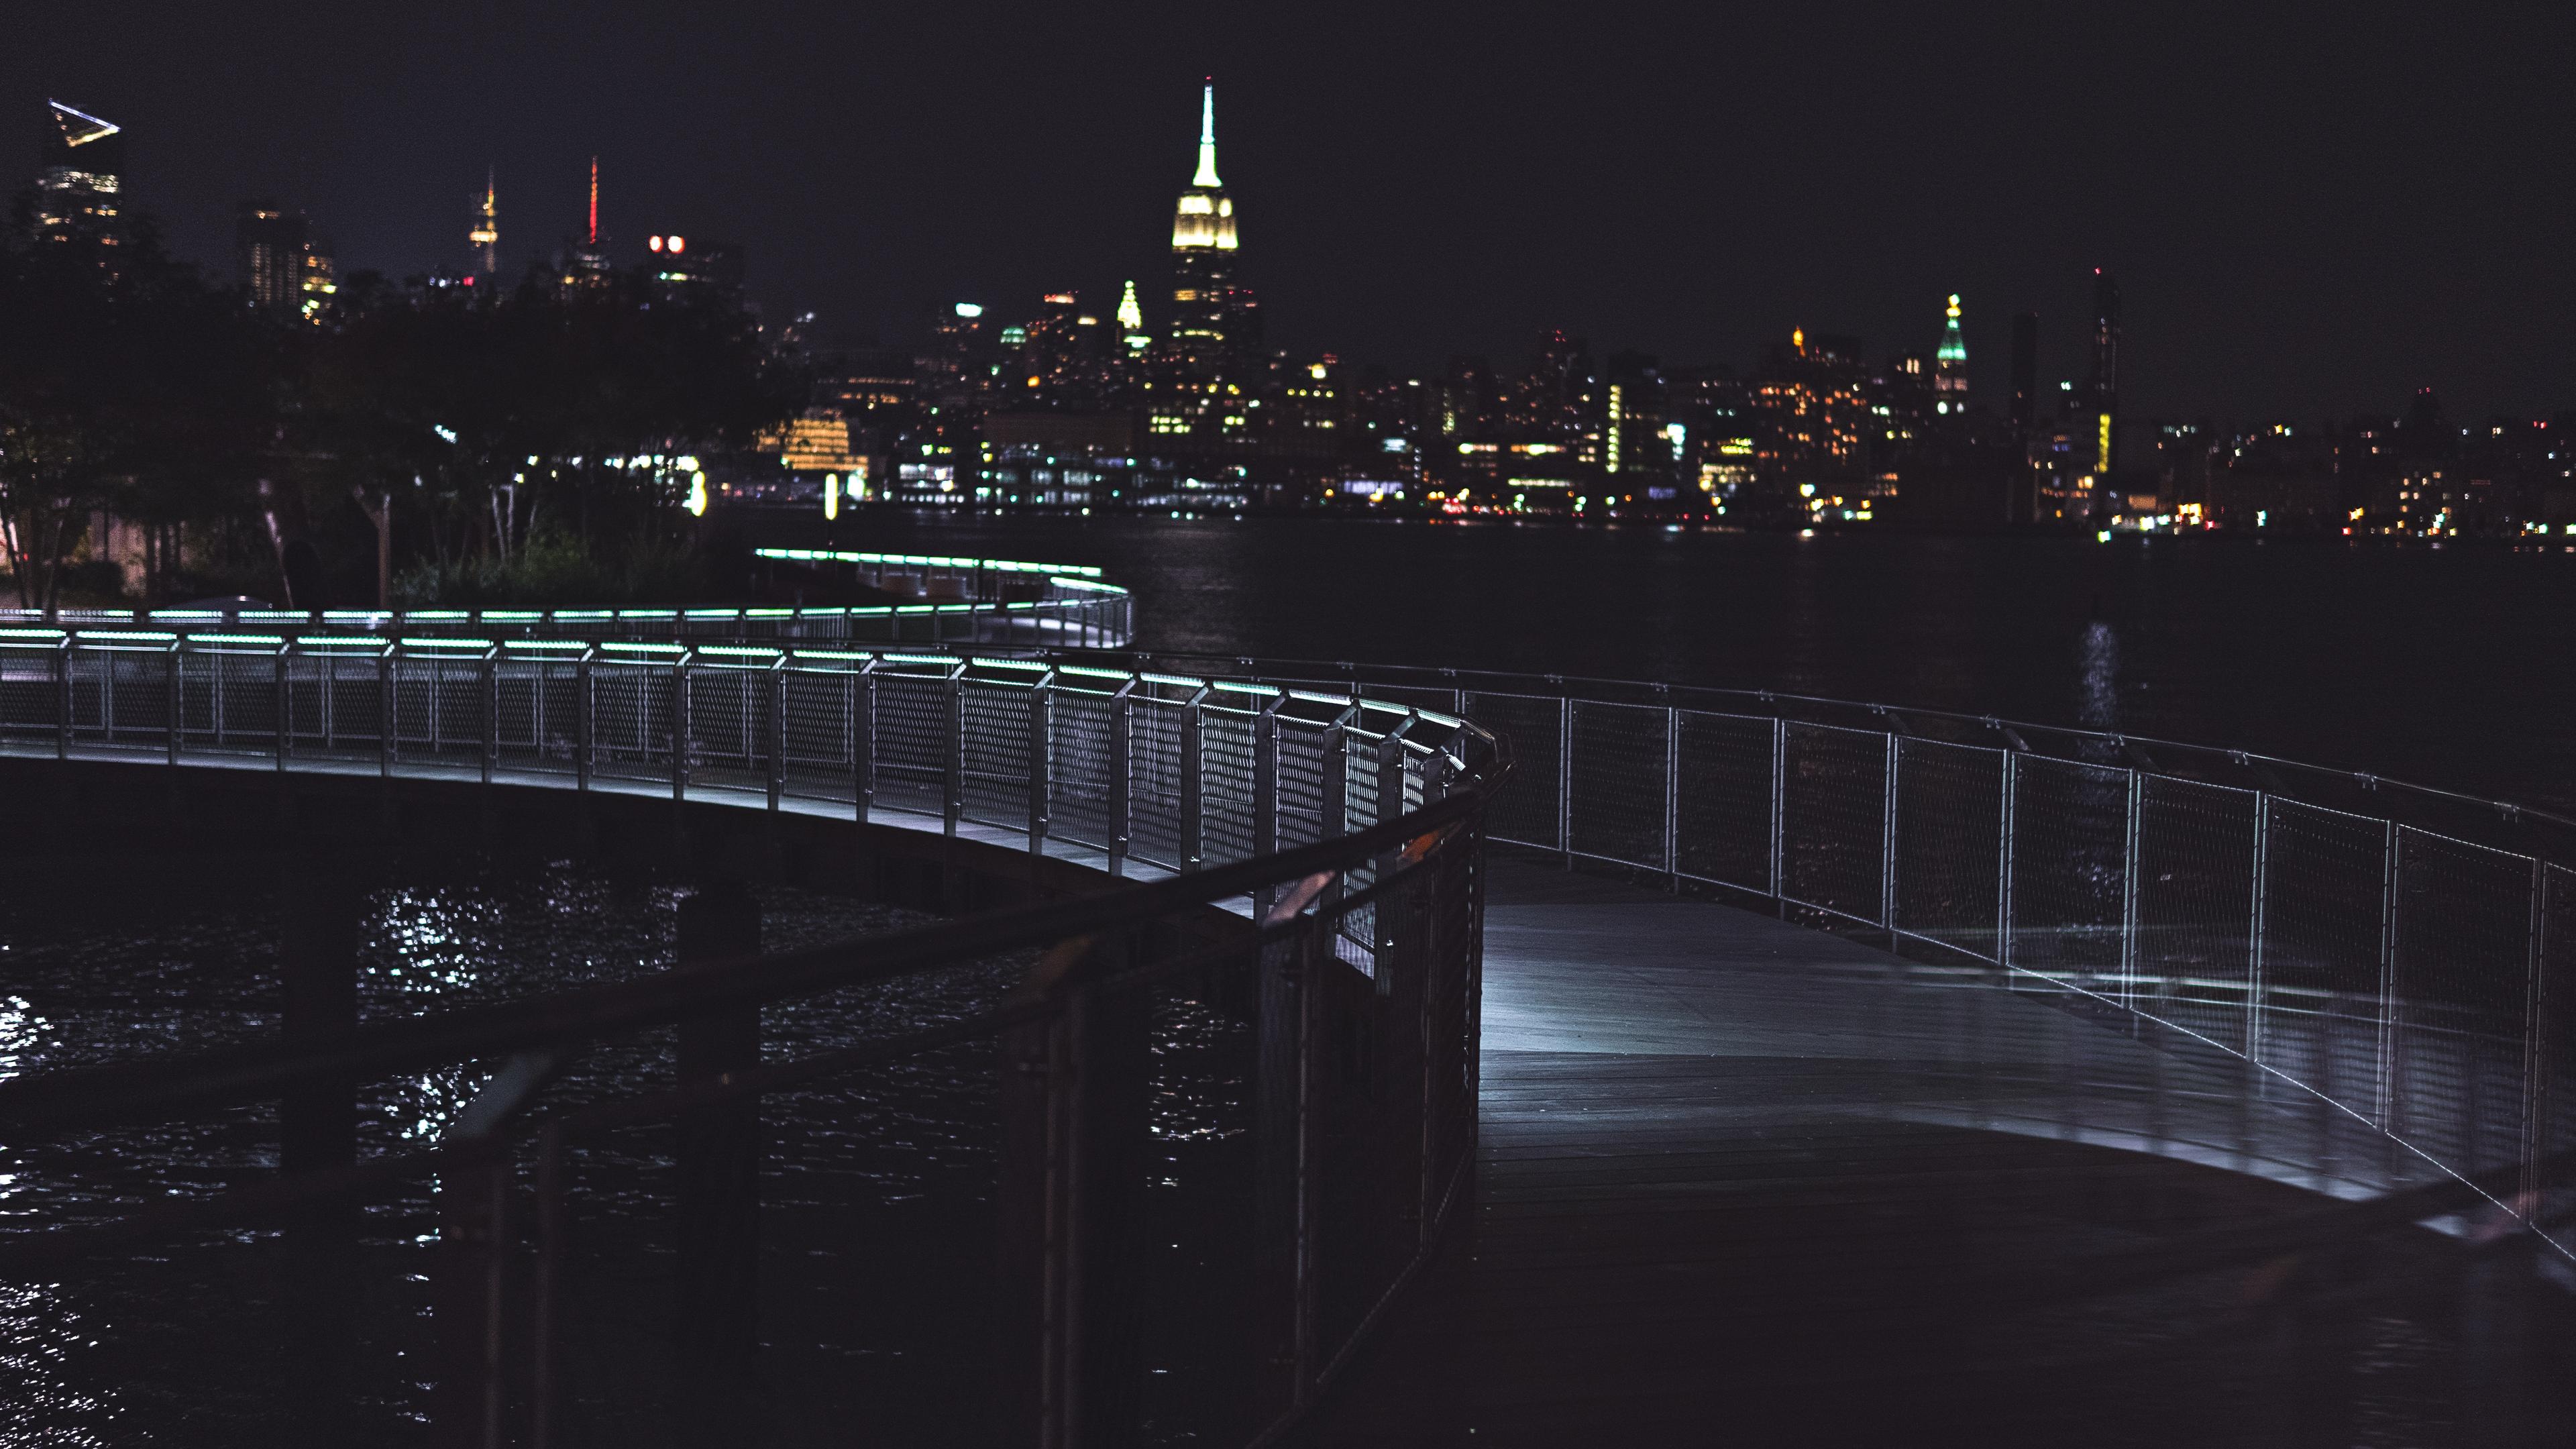 bridge night city night 4k 1538065295 - bridge, night city, night 4k - night city, Night, bridge